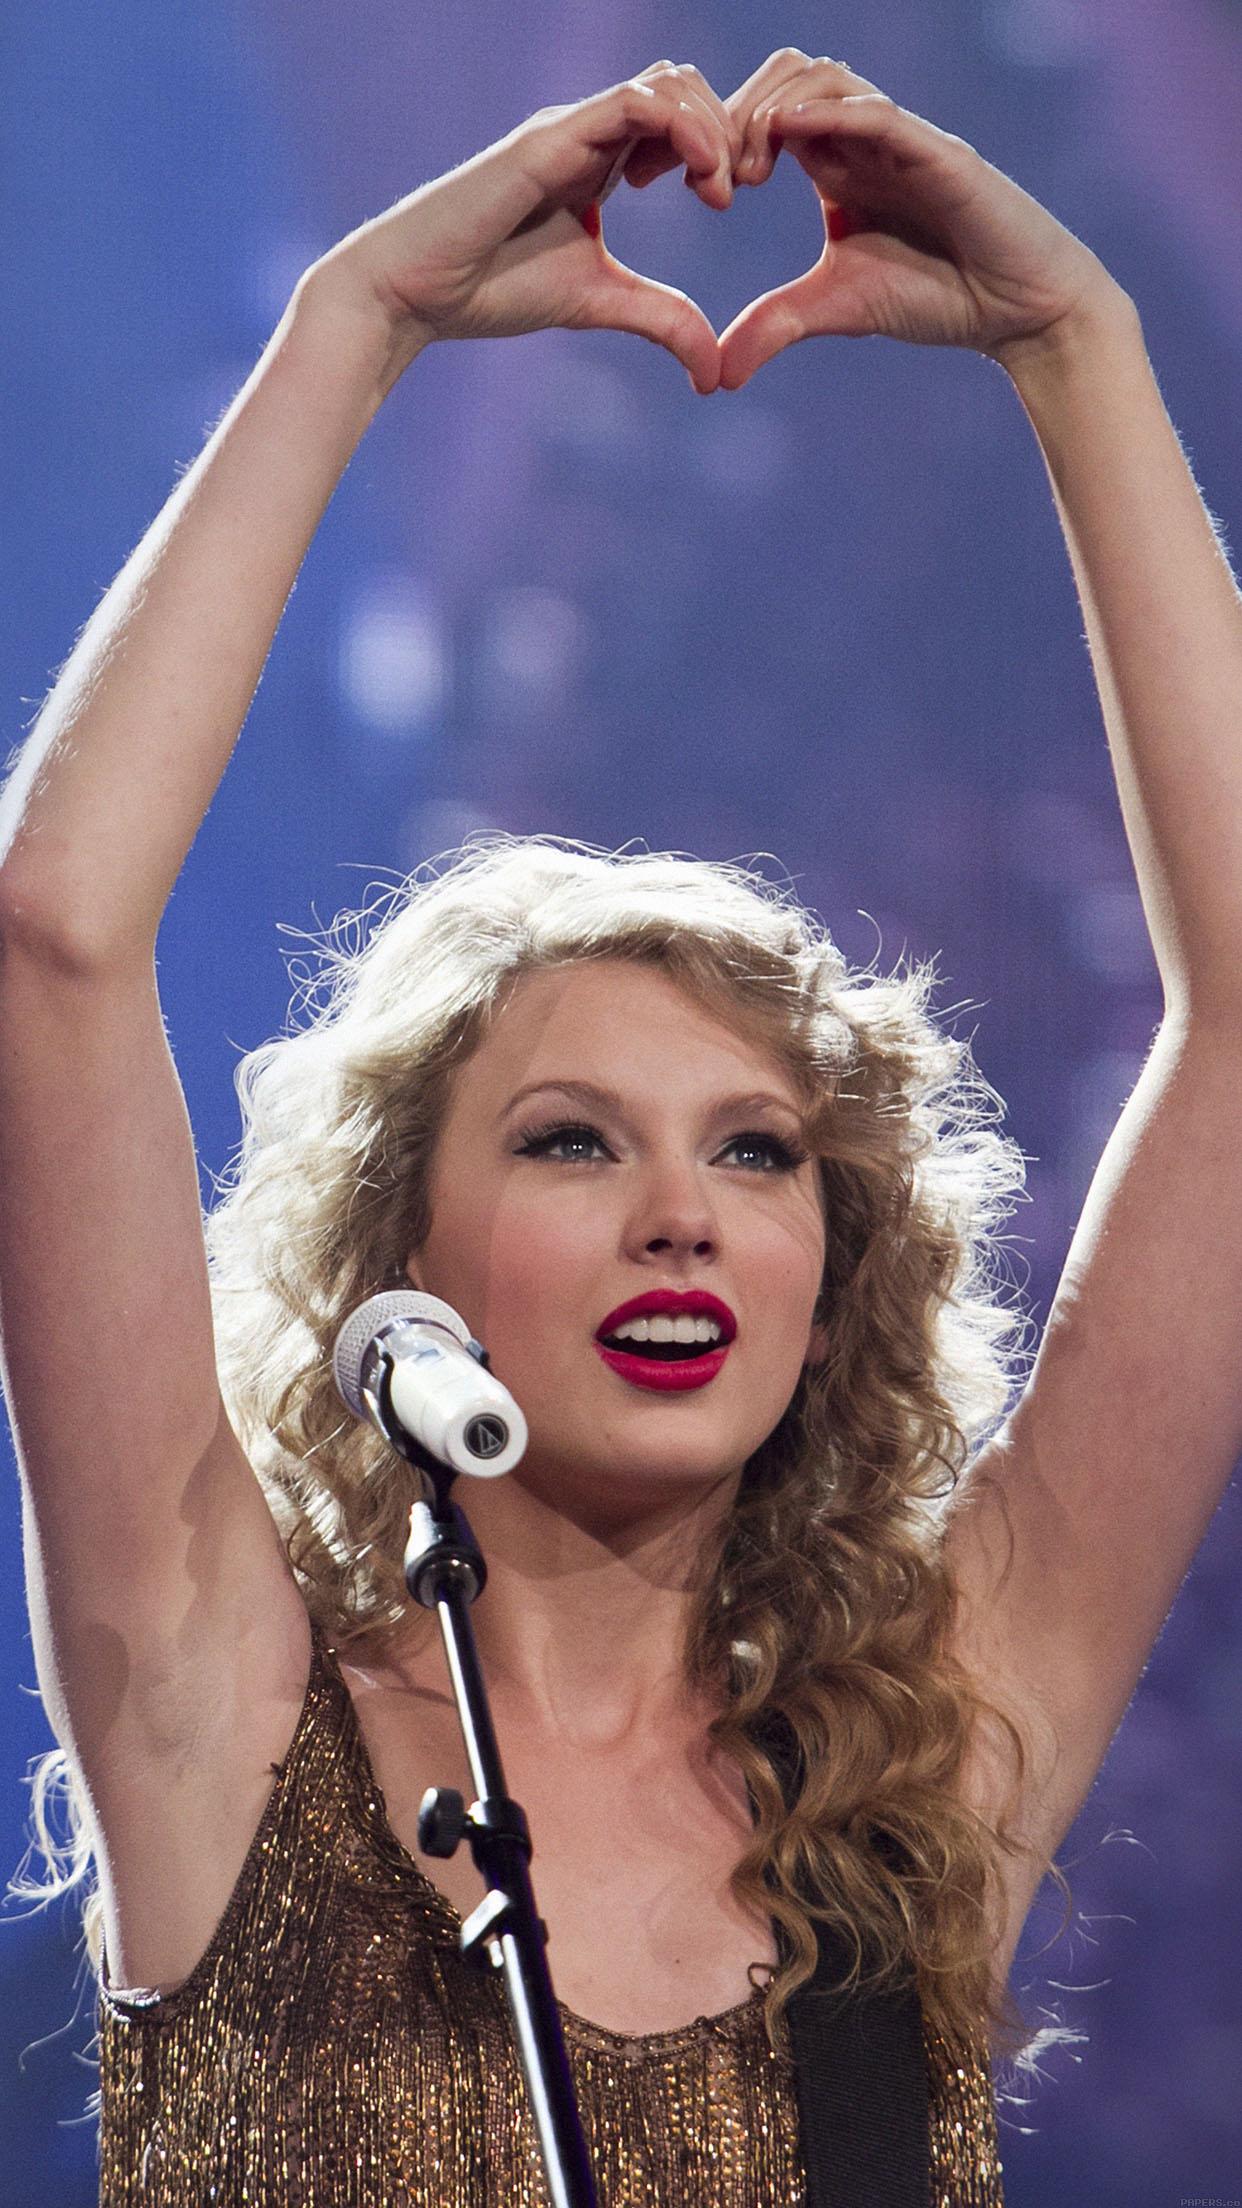 Apple Car Wallpaper Ha98 Wallpaper Taylor Swift Love Concert Music Girl Face